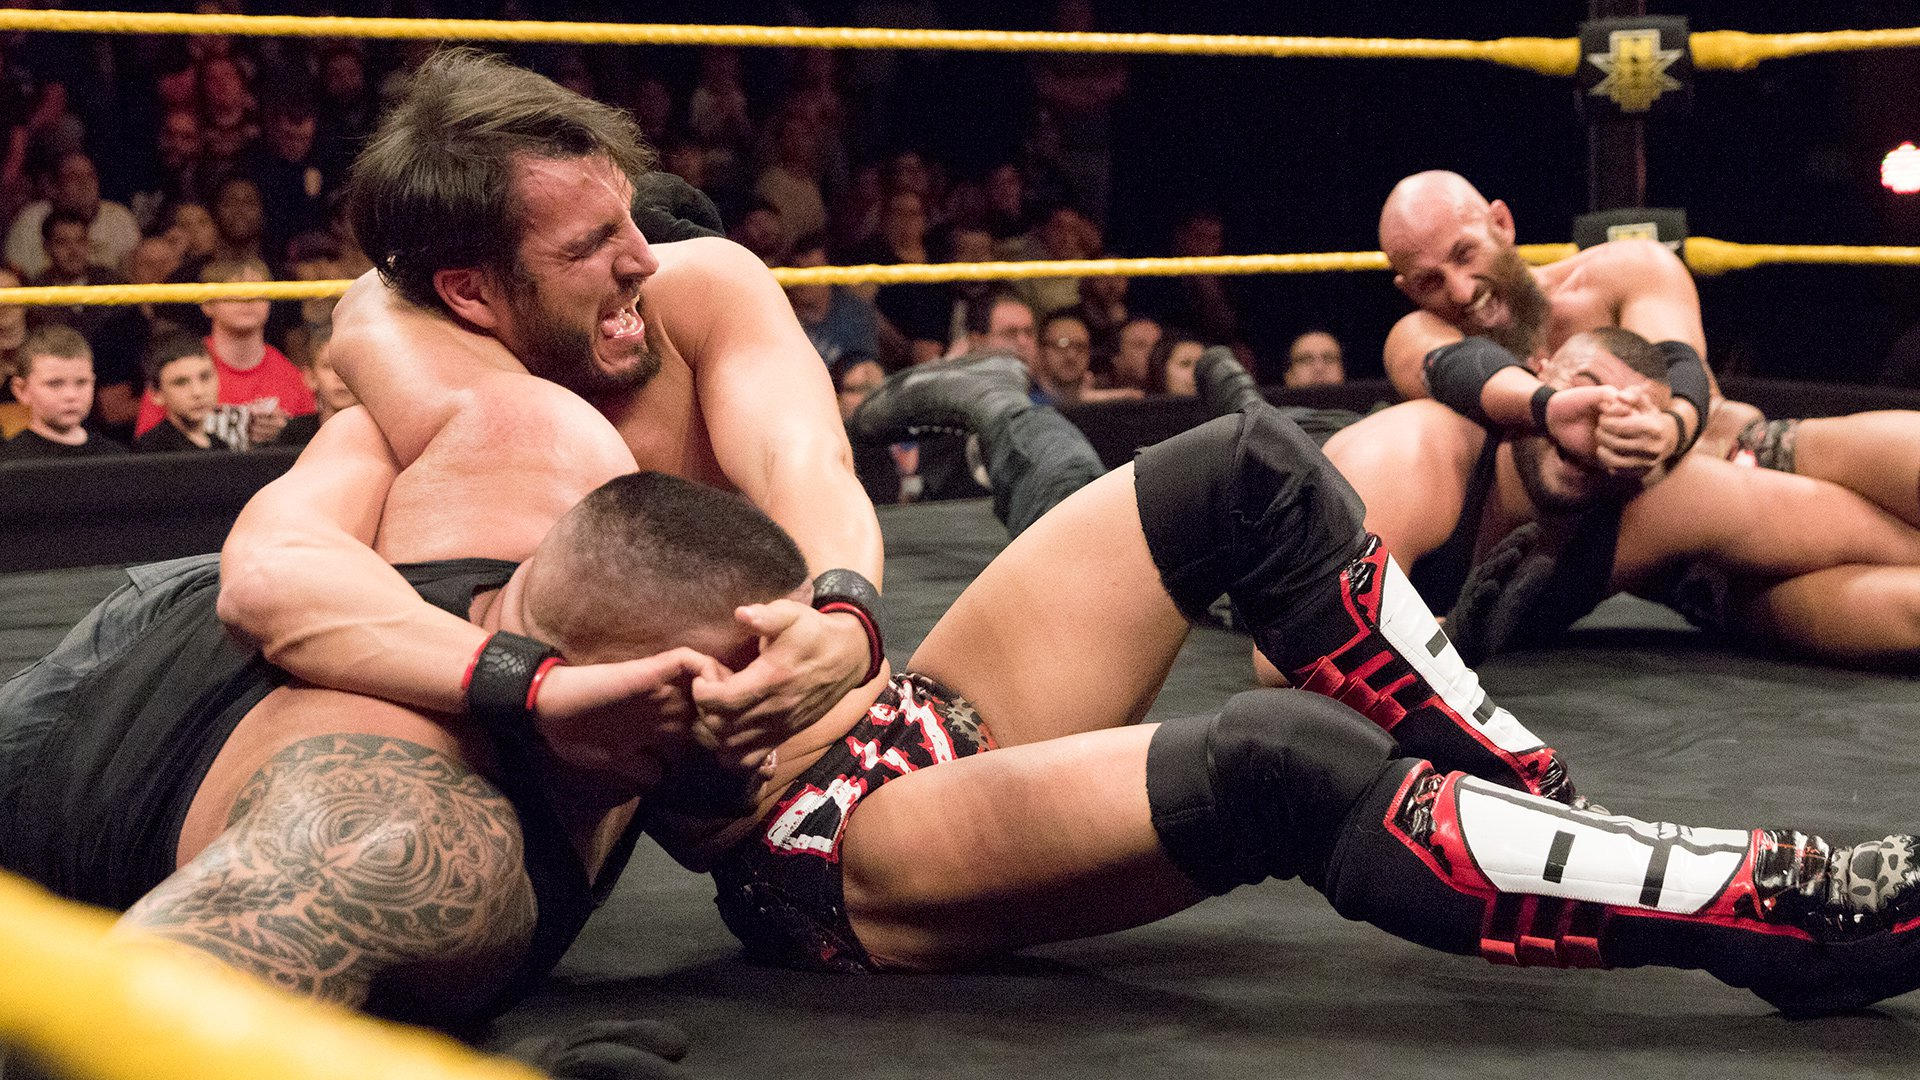 Resultats WWE NXT 1 mars 2017